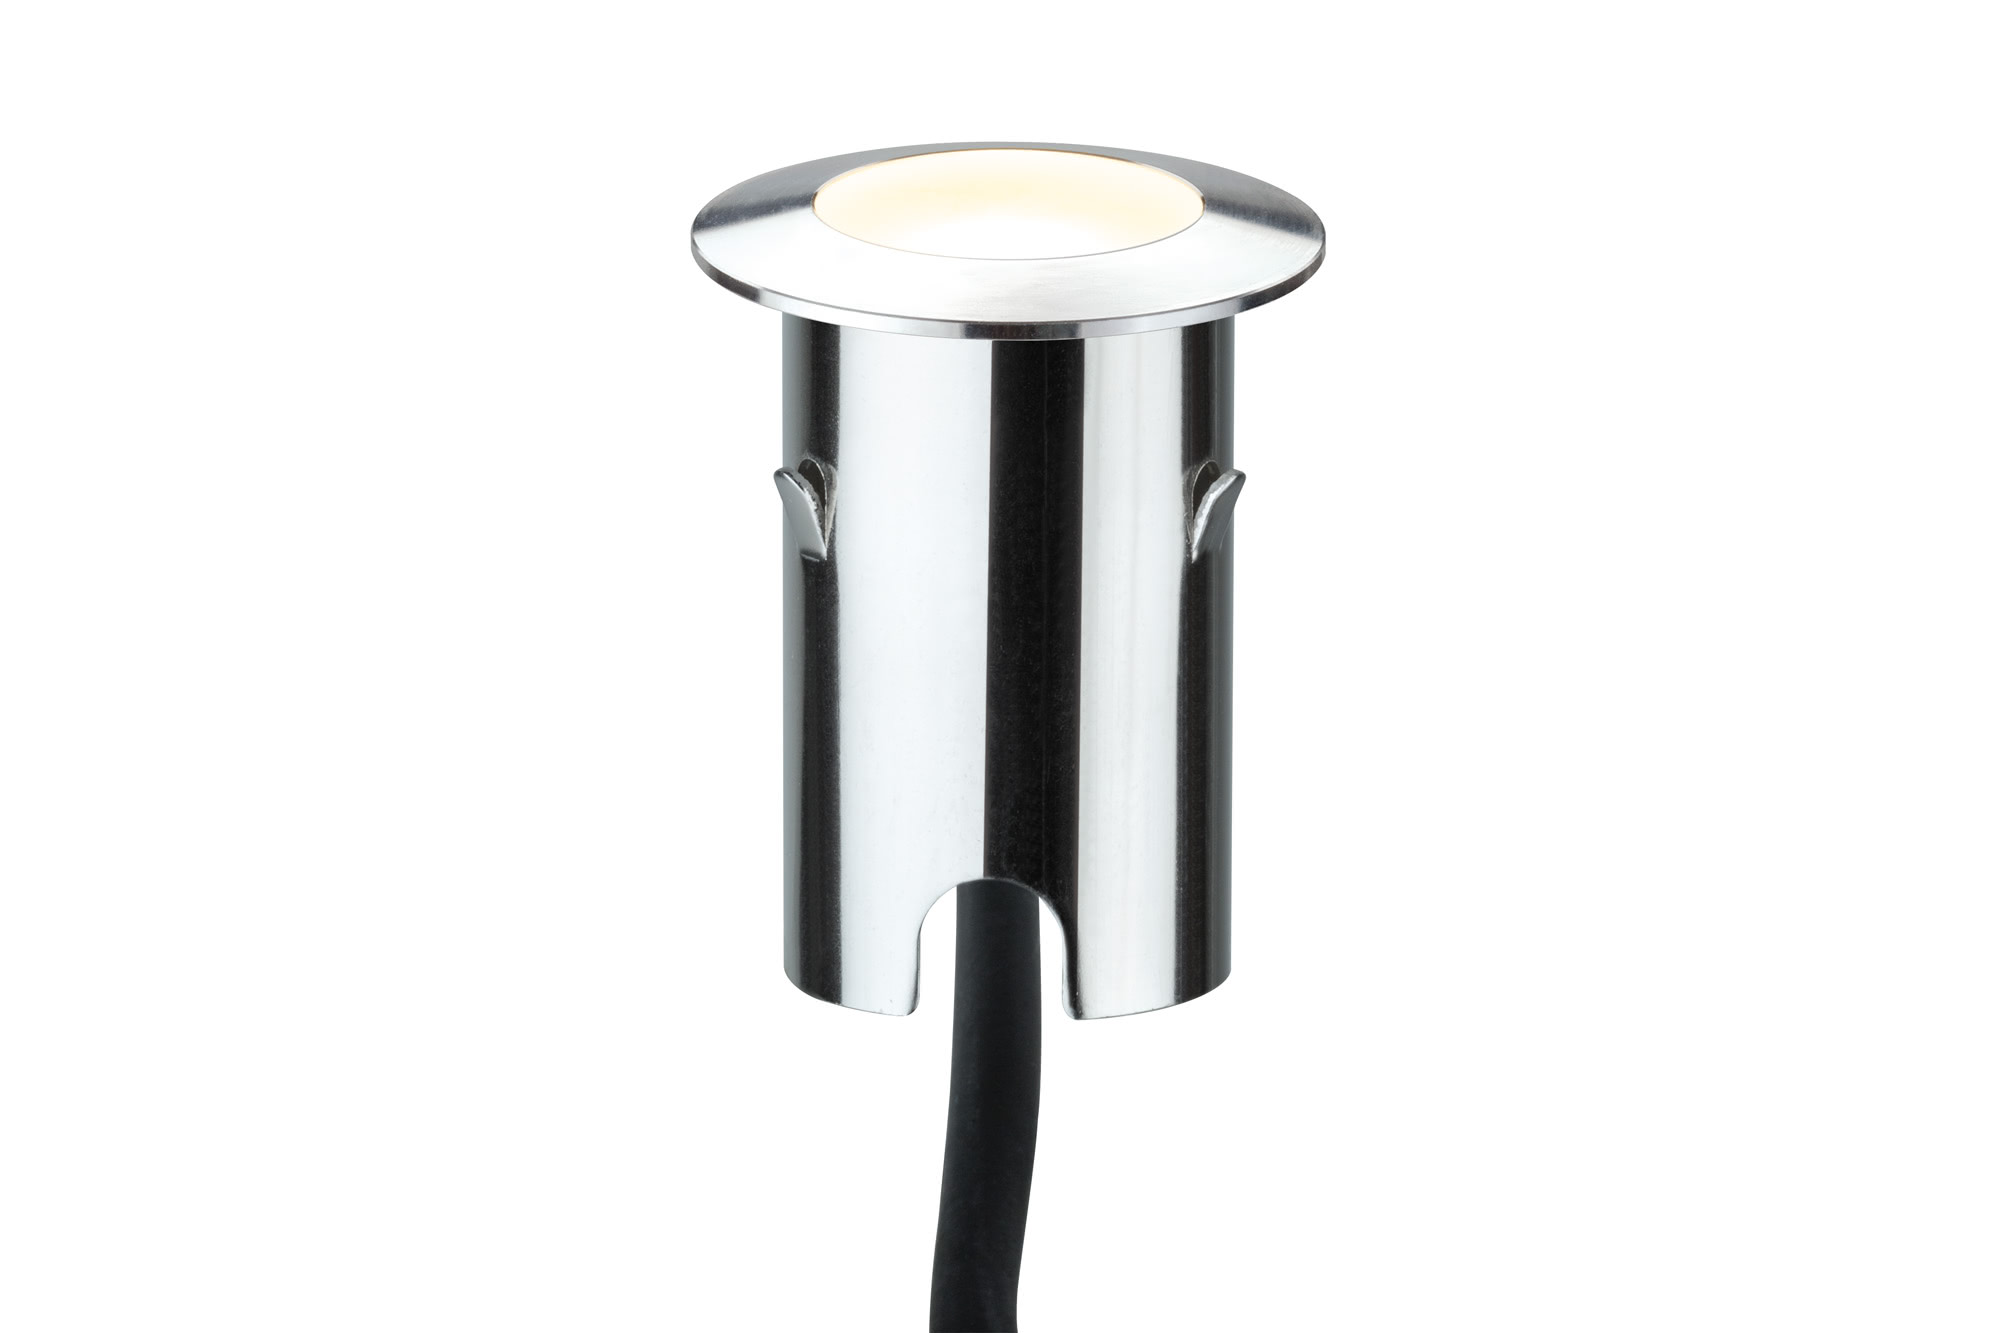 Paulmann. 93783 Комплект светильников MiniBoden EBL rund IP67 Erg.Set 4x1W, без трансформатора